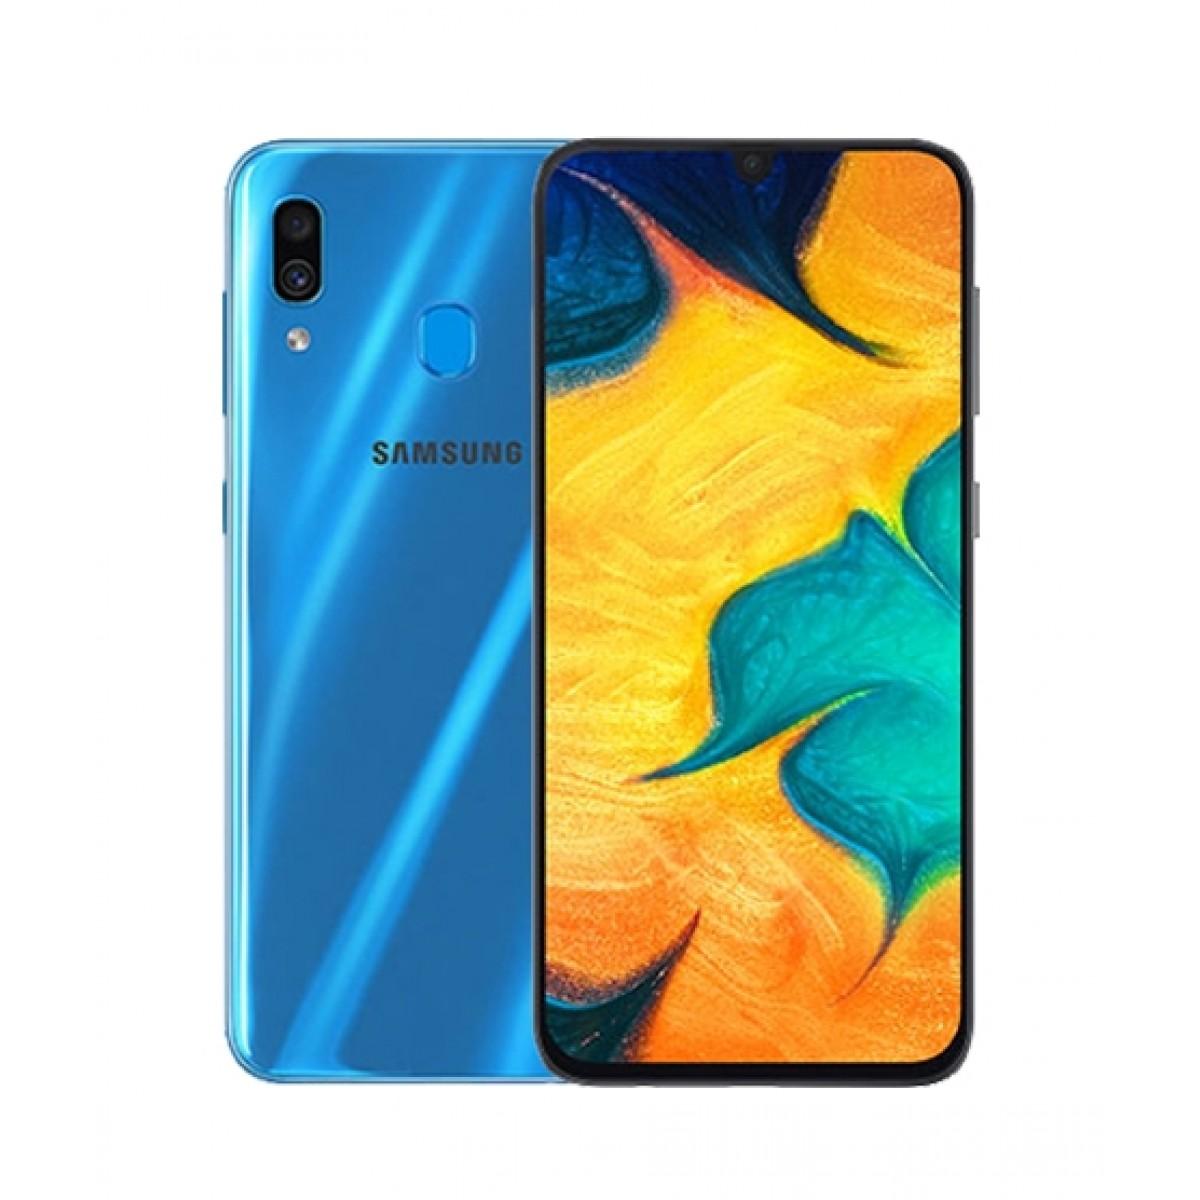 Samsung Galaxy A30 64GB Dual Sim Blue - Non PTA Compliant